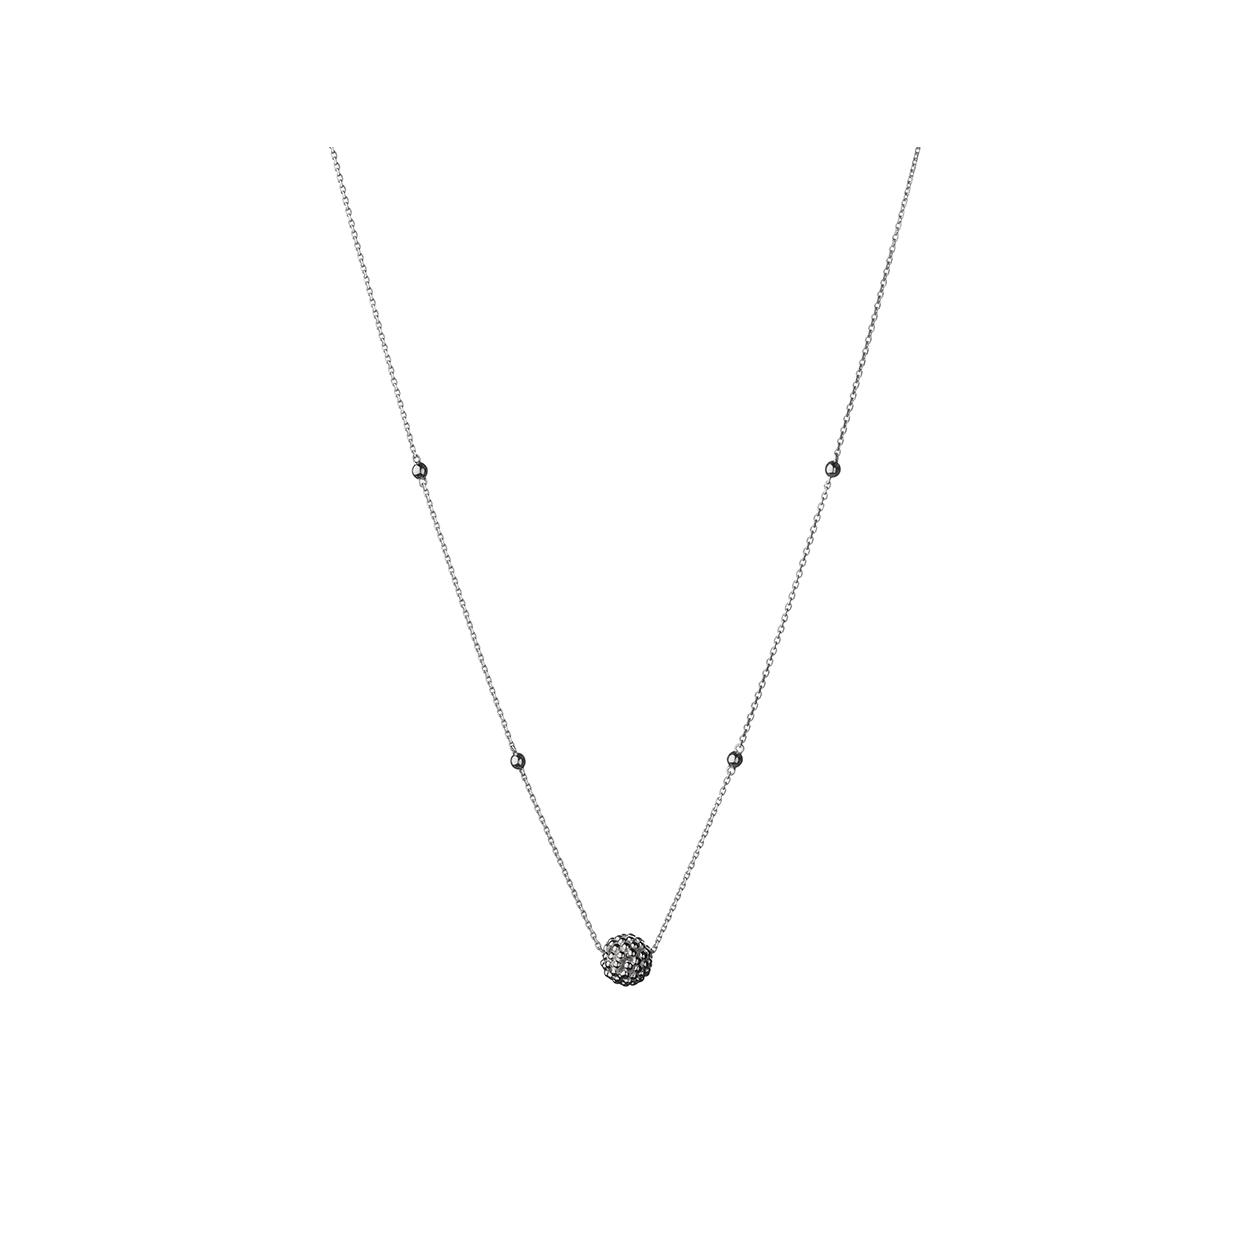 1e275476e24 Effervescence Sterling Silver Bubble Necklace - FJ Zelley